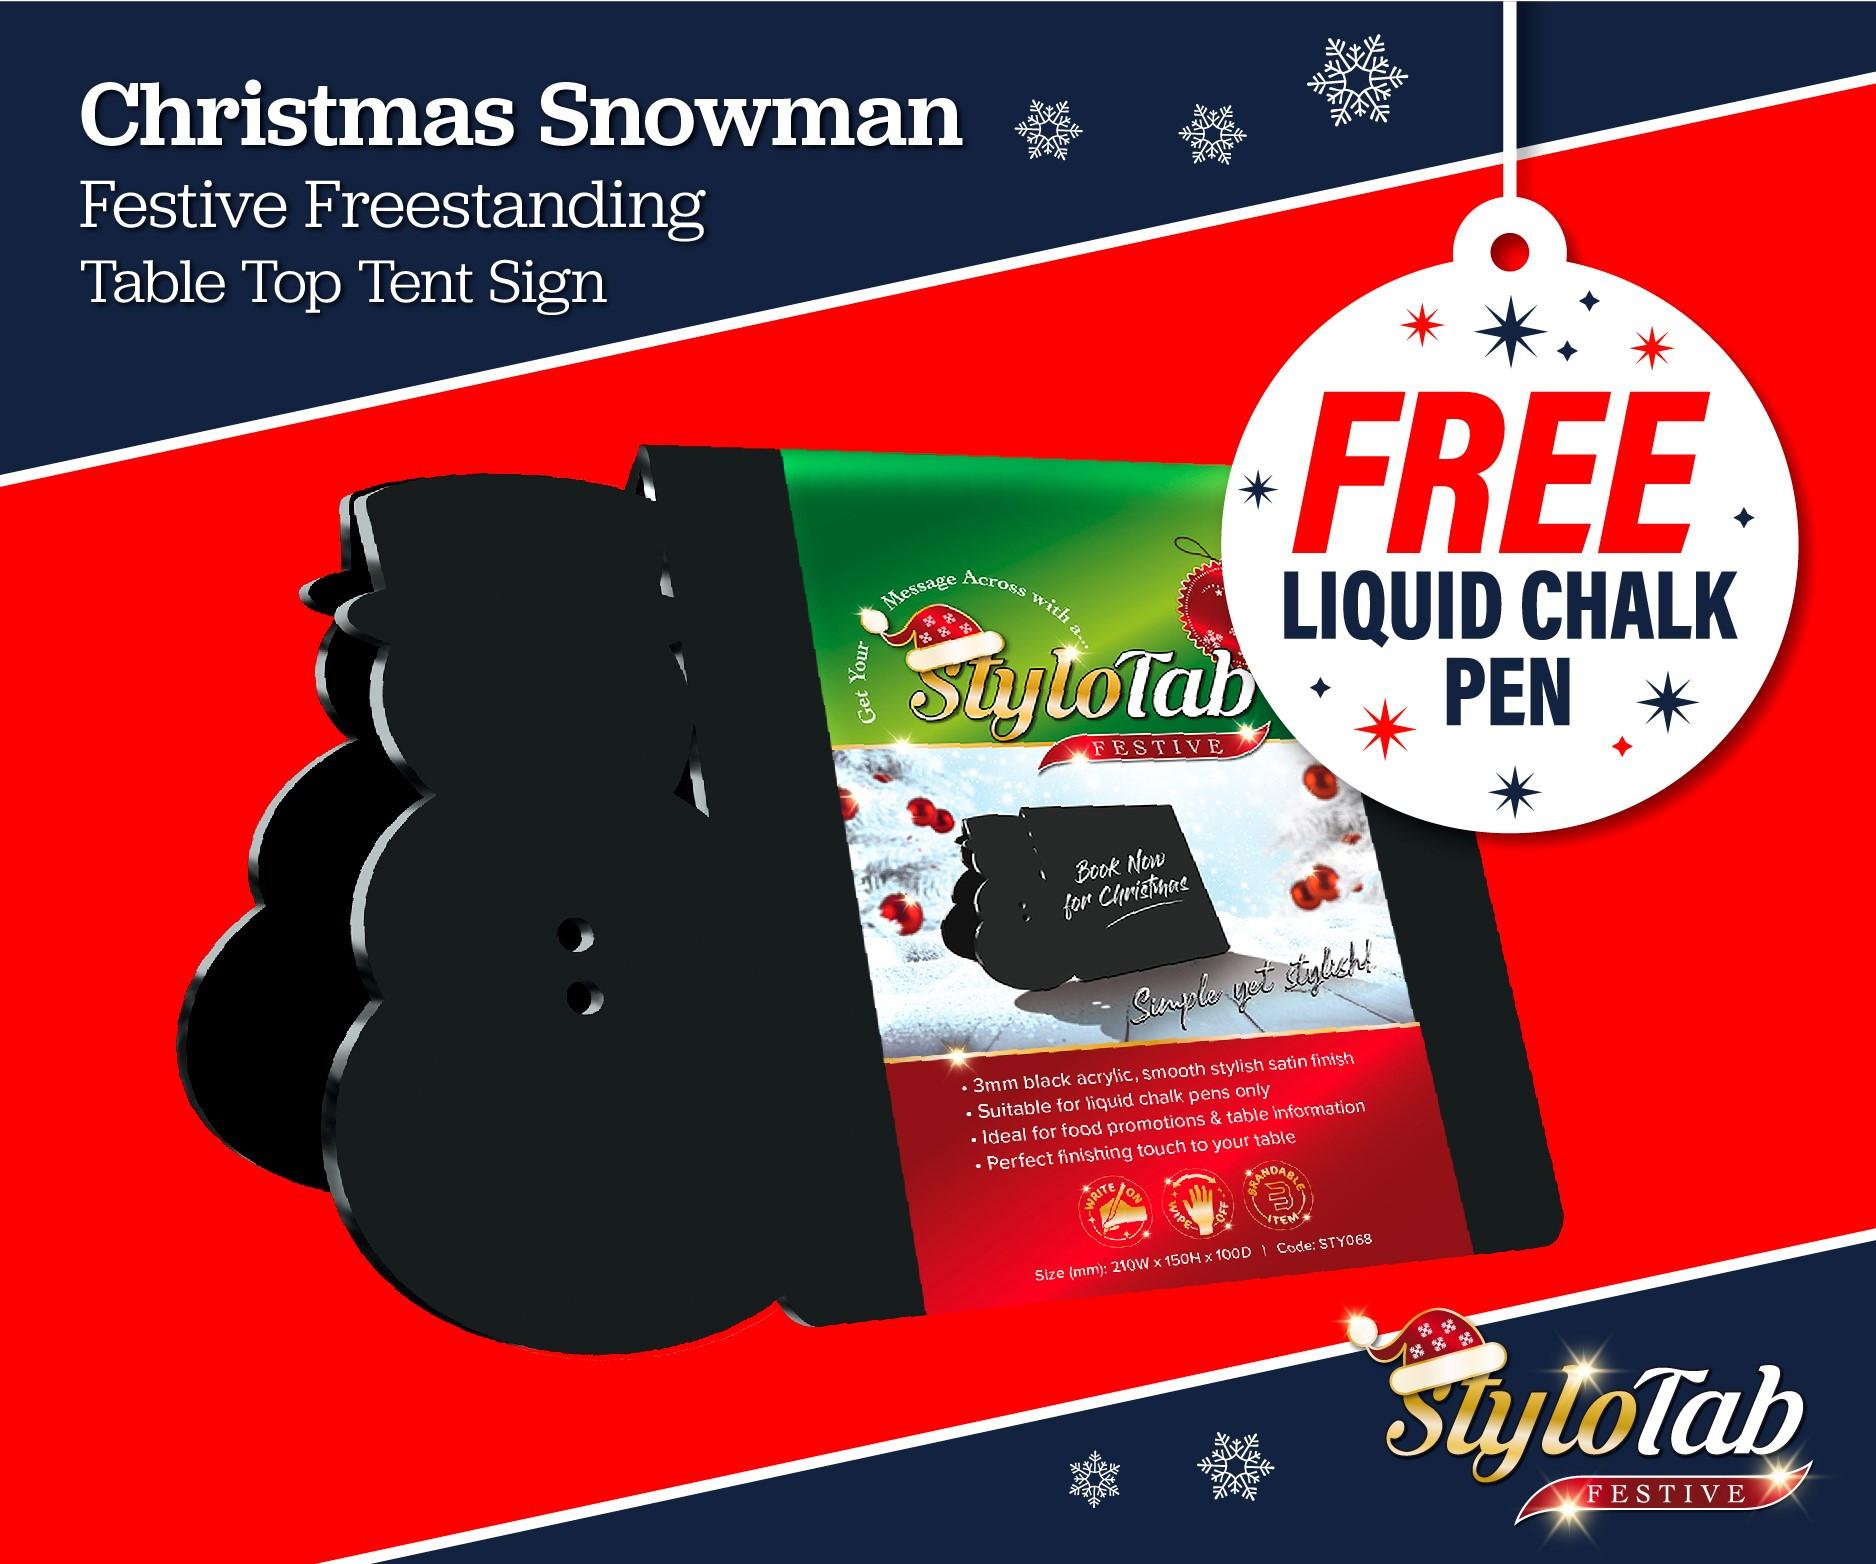 Snowman stylotab Festive Freestanding table top tent sign